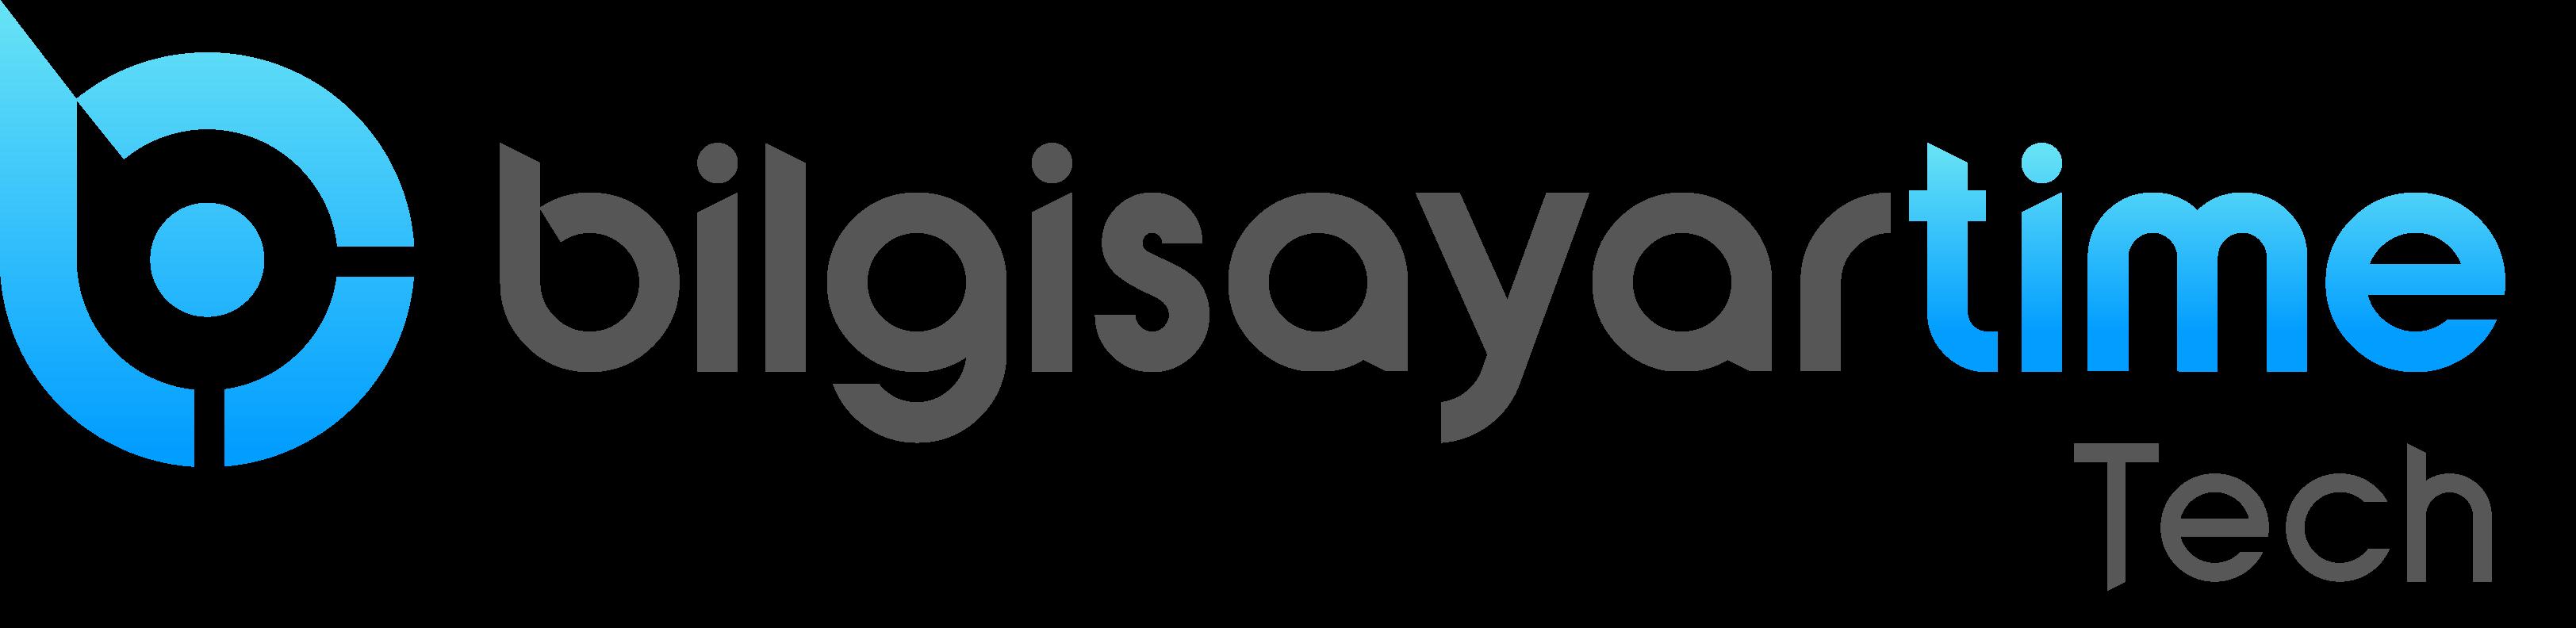 Bilgisayar Time Tech logo